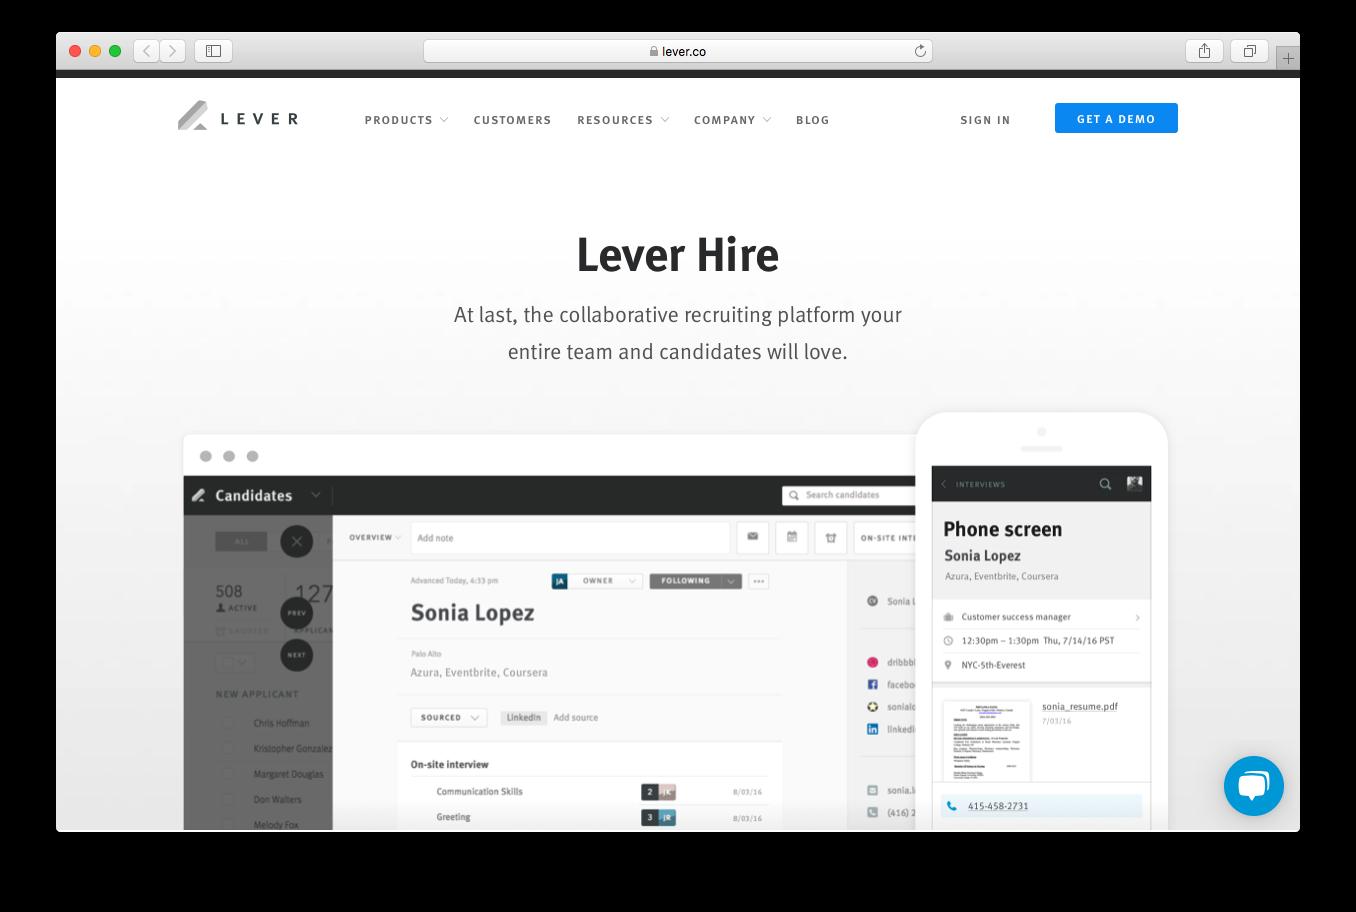 lever hire collaborative recruitment platform team candidates